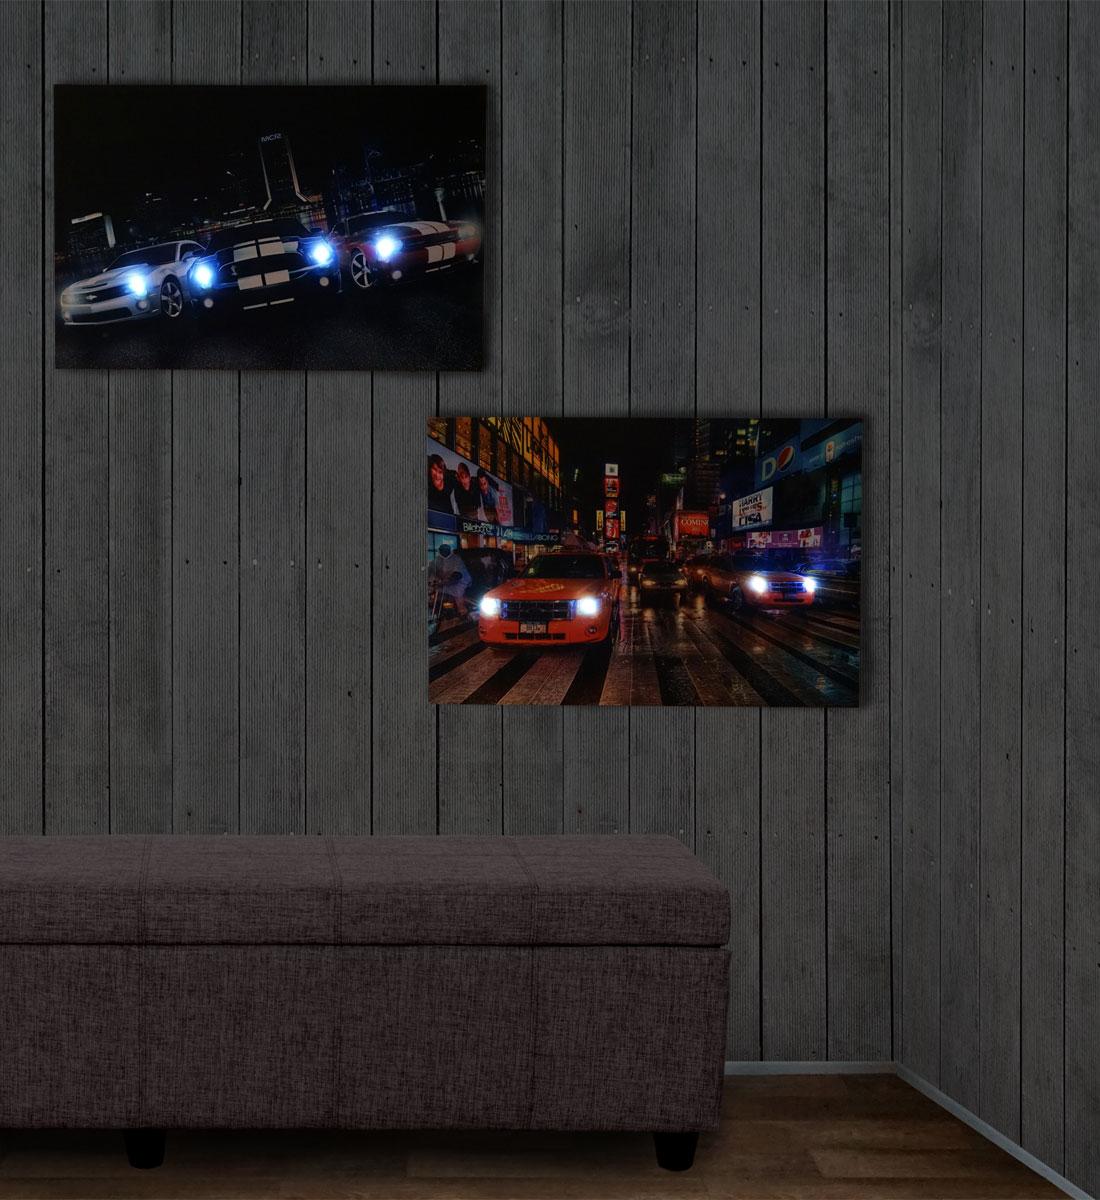 2x led bild mit beleuchtung leinwandbild leuchtbild wandbild 60x40cm timer cars. Black Bedroom Furniture Sets. Home Design Ideas